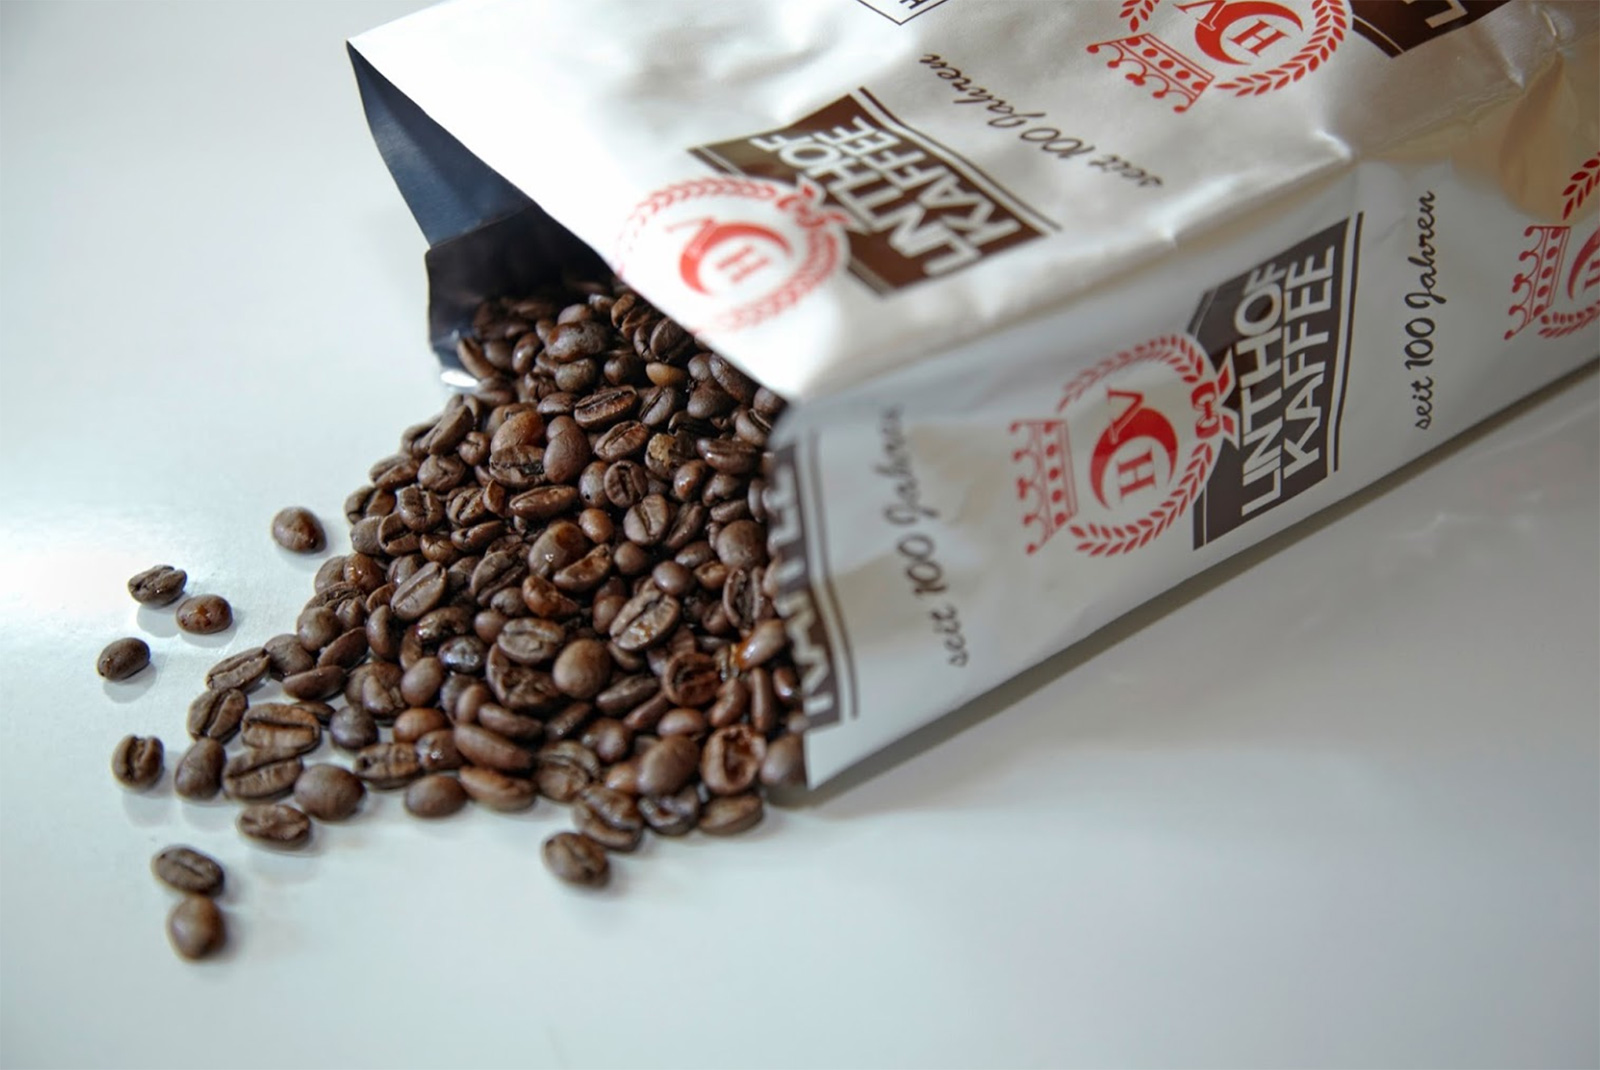 Linthof Kaffee